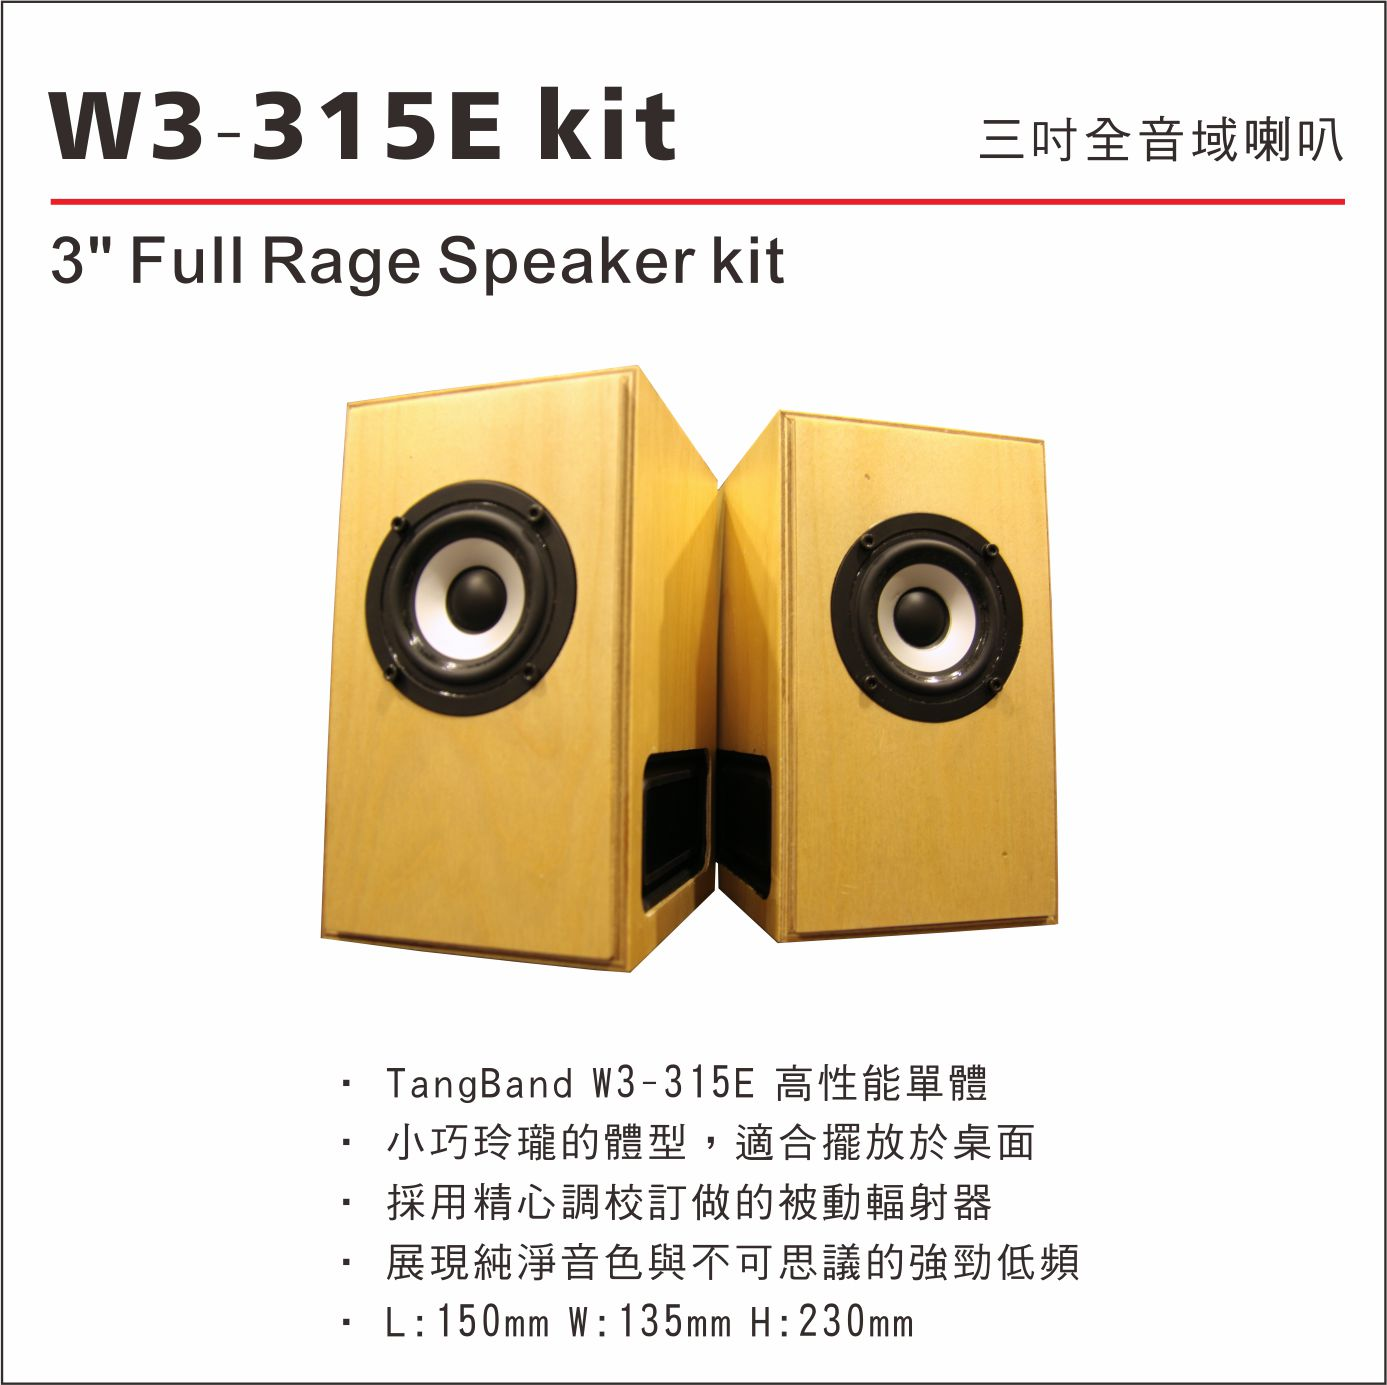 W3-315E kit 全頻喇叭【已售完】